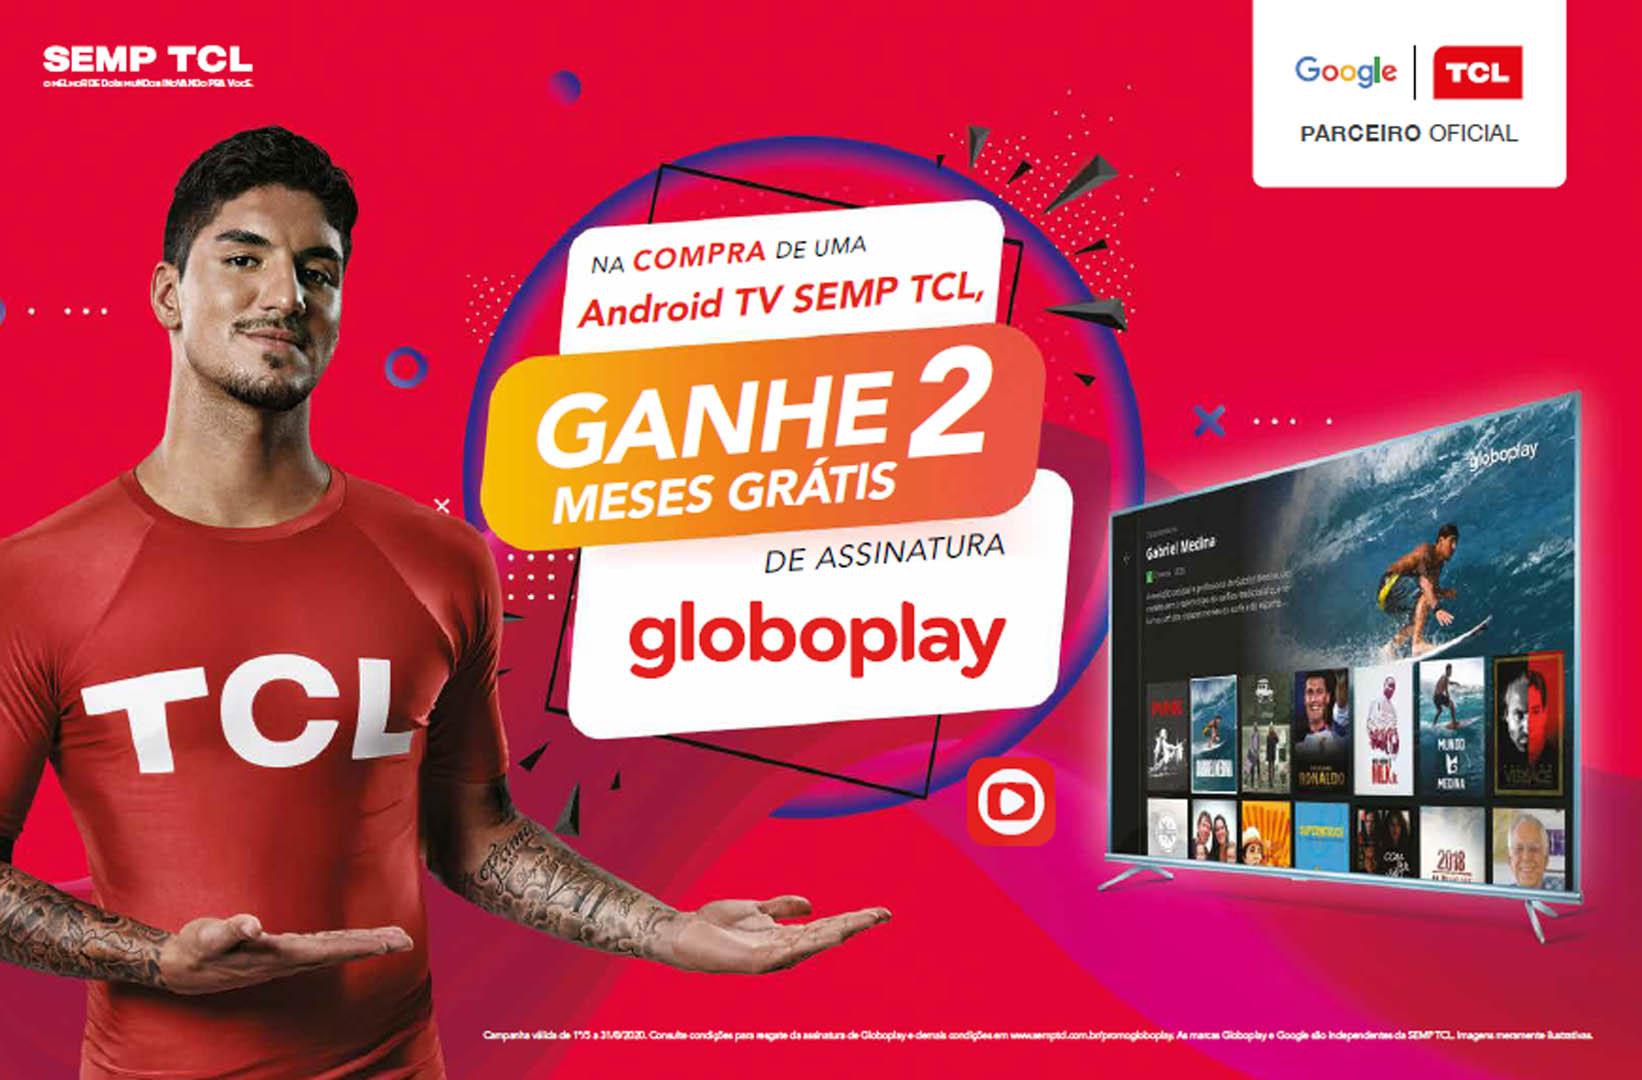 SEMP TCL lança Promoção Android TV